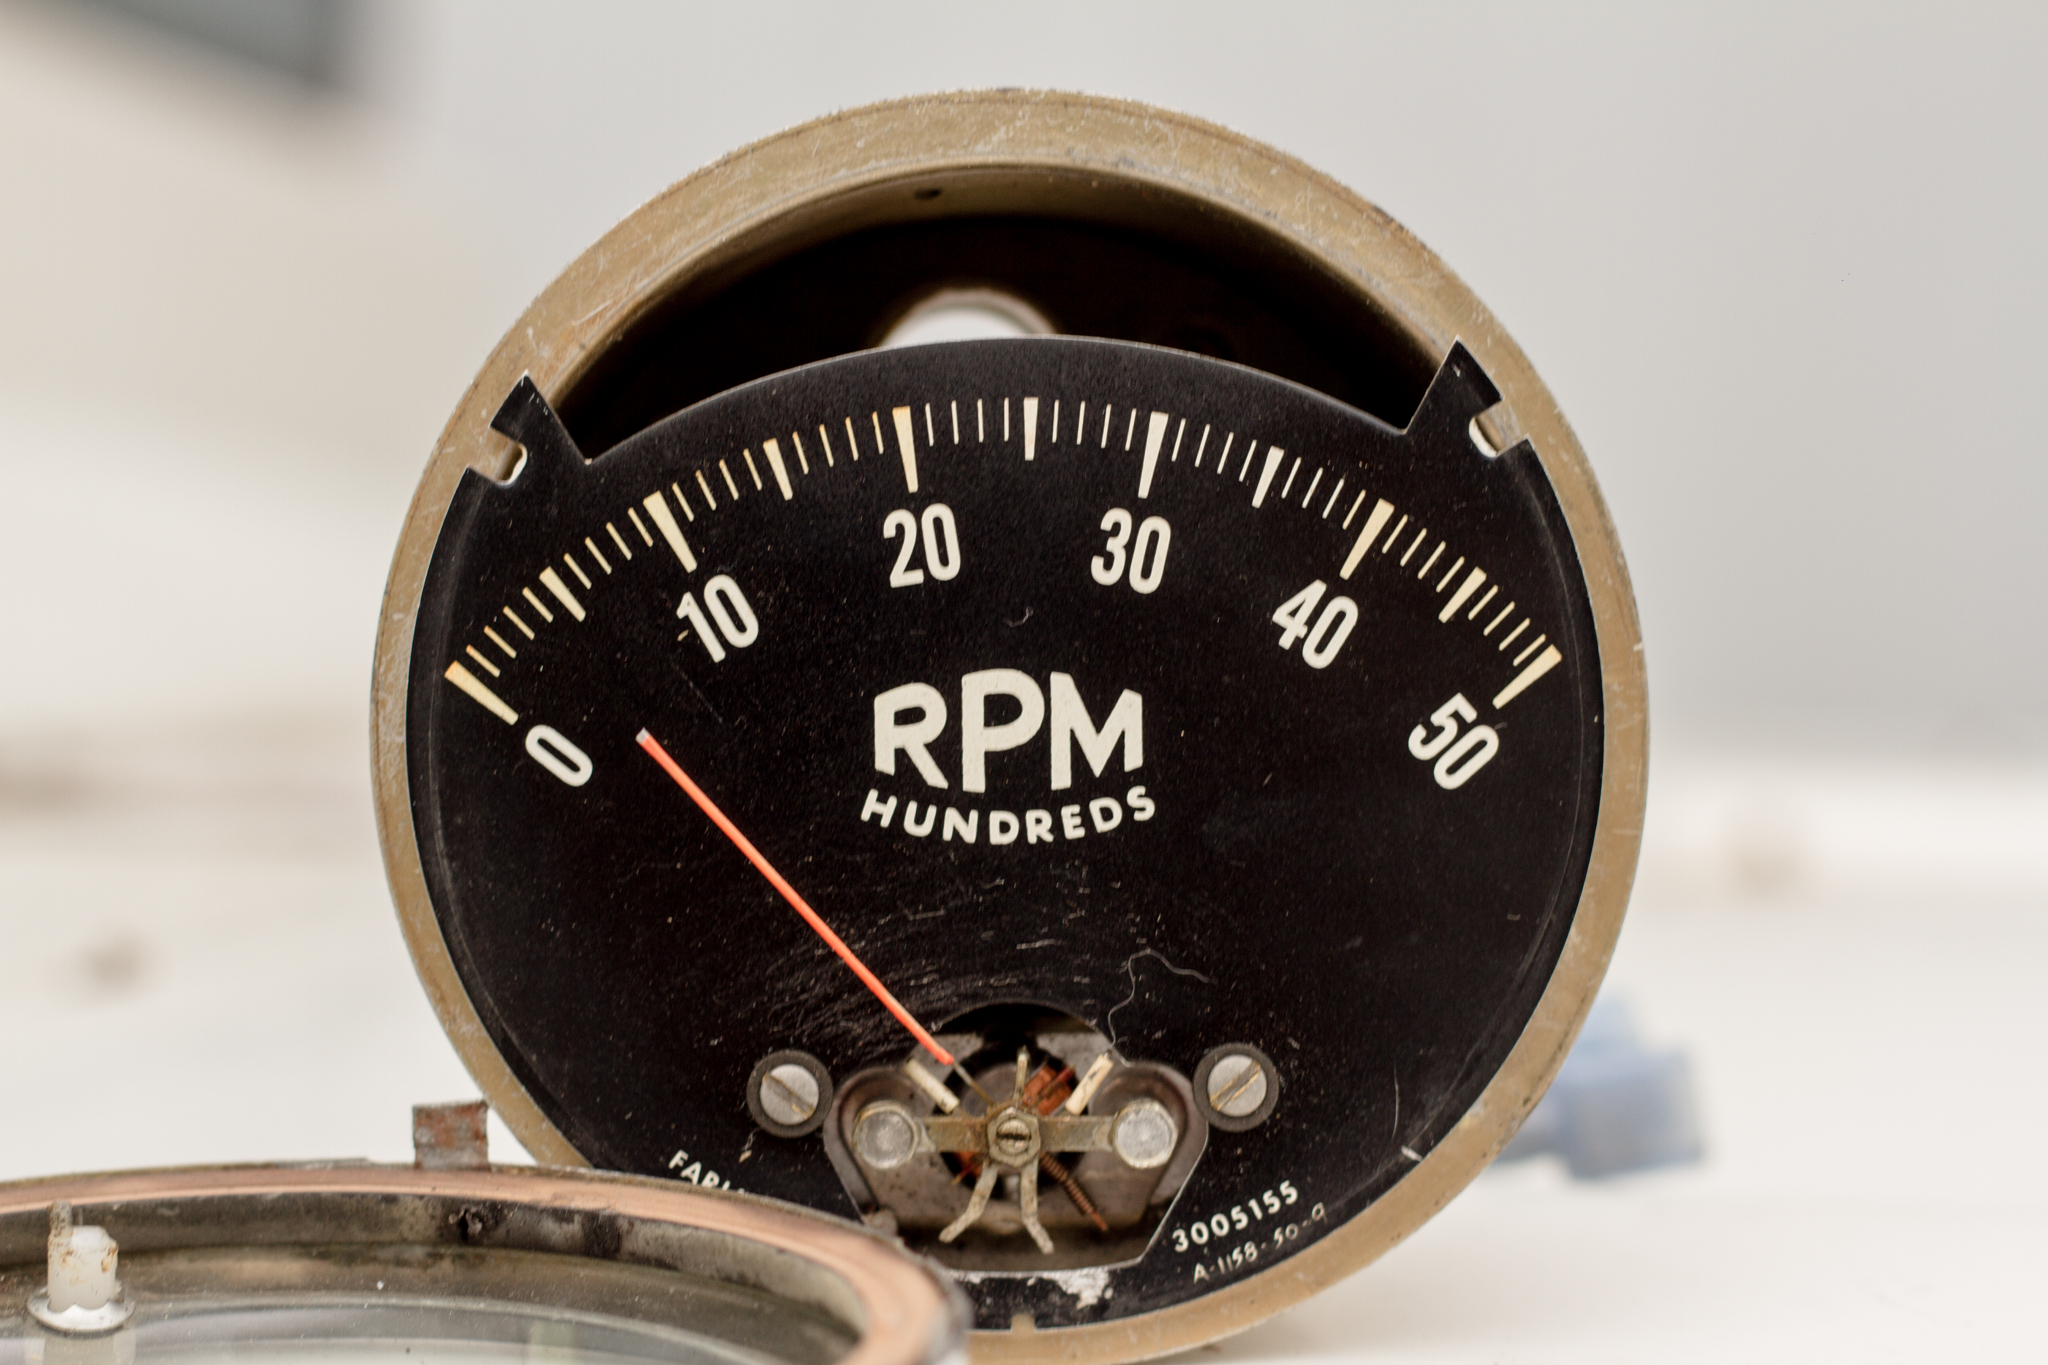 mg_0714?w\=930\&h\=620 vintage stewart warner tachometer wiring diagram stewart warner vintage stewart warner tachometer wiring diagram at webbmarketing.co